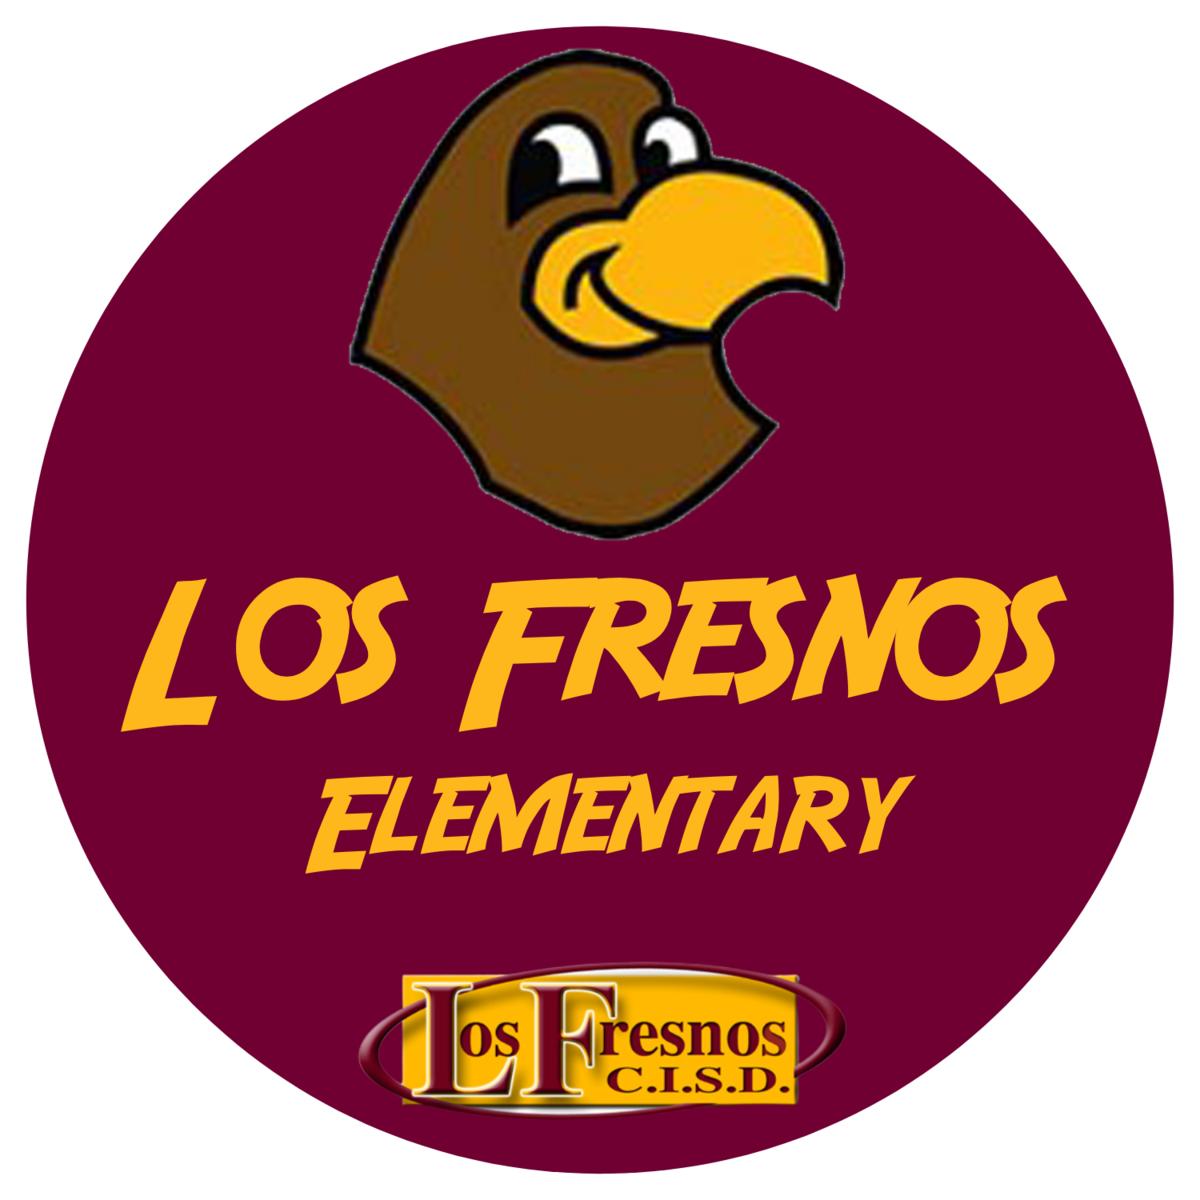 Los Fresnos Elementary School logo